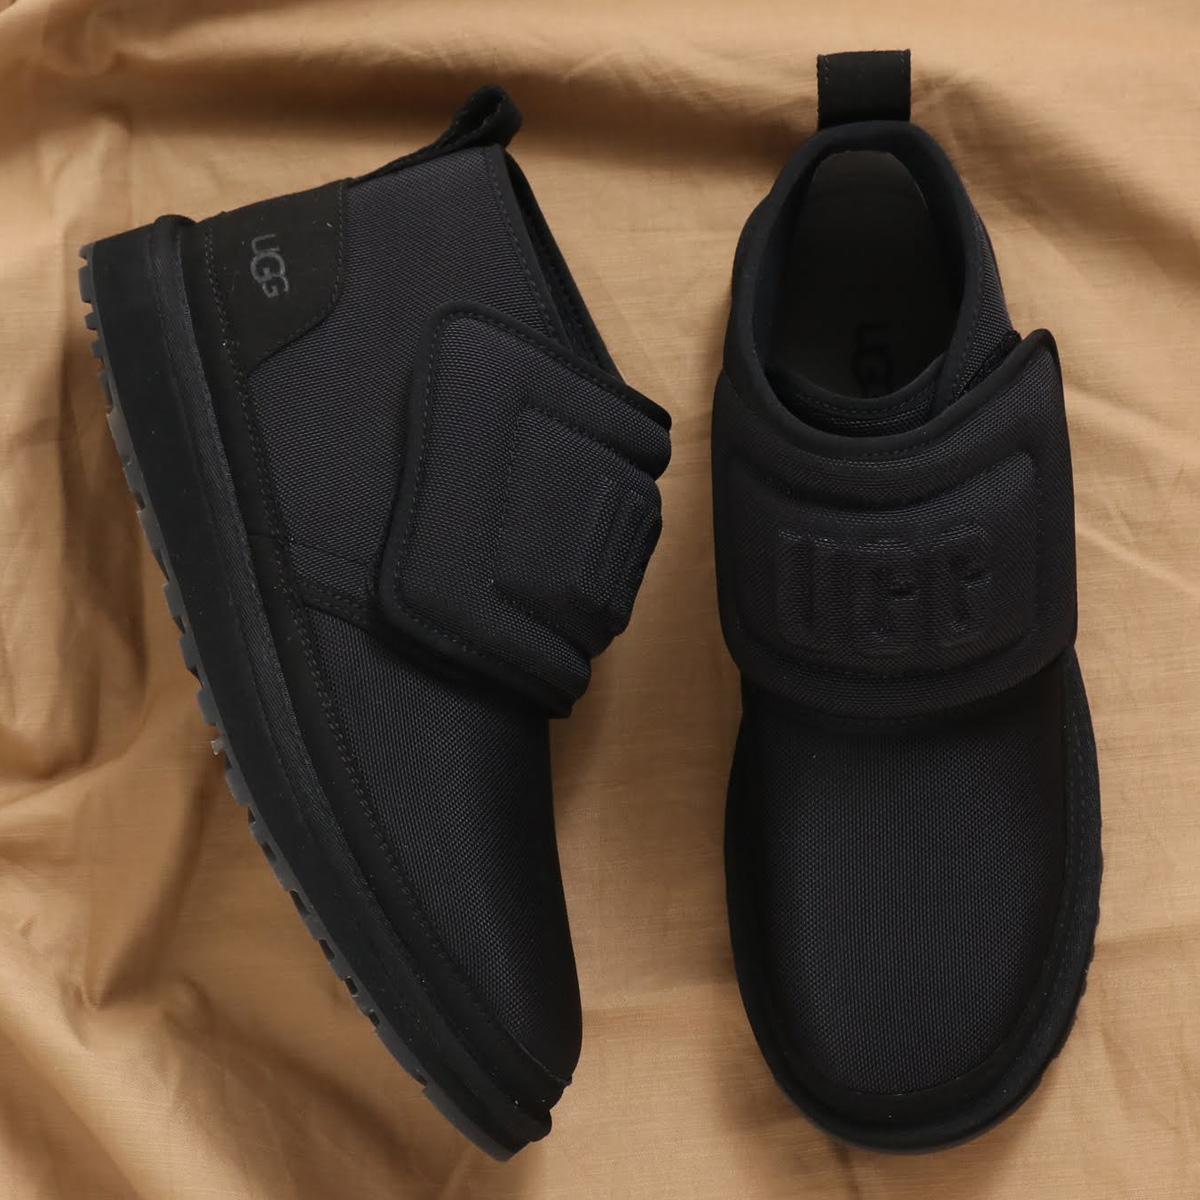 UGG Neumel Molded Logo(アグ ニューメル アグモルデッド ロゴ)BLACK【メンズ ブーツ】20SS-I